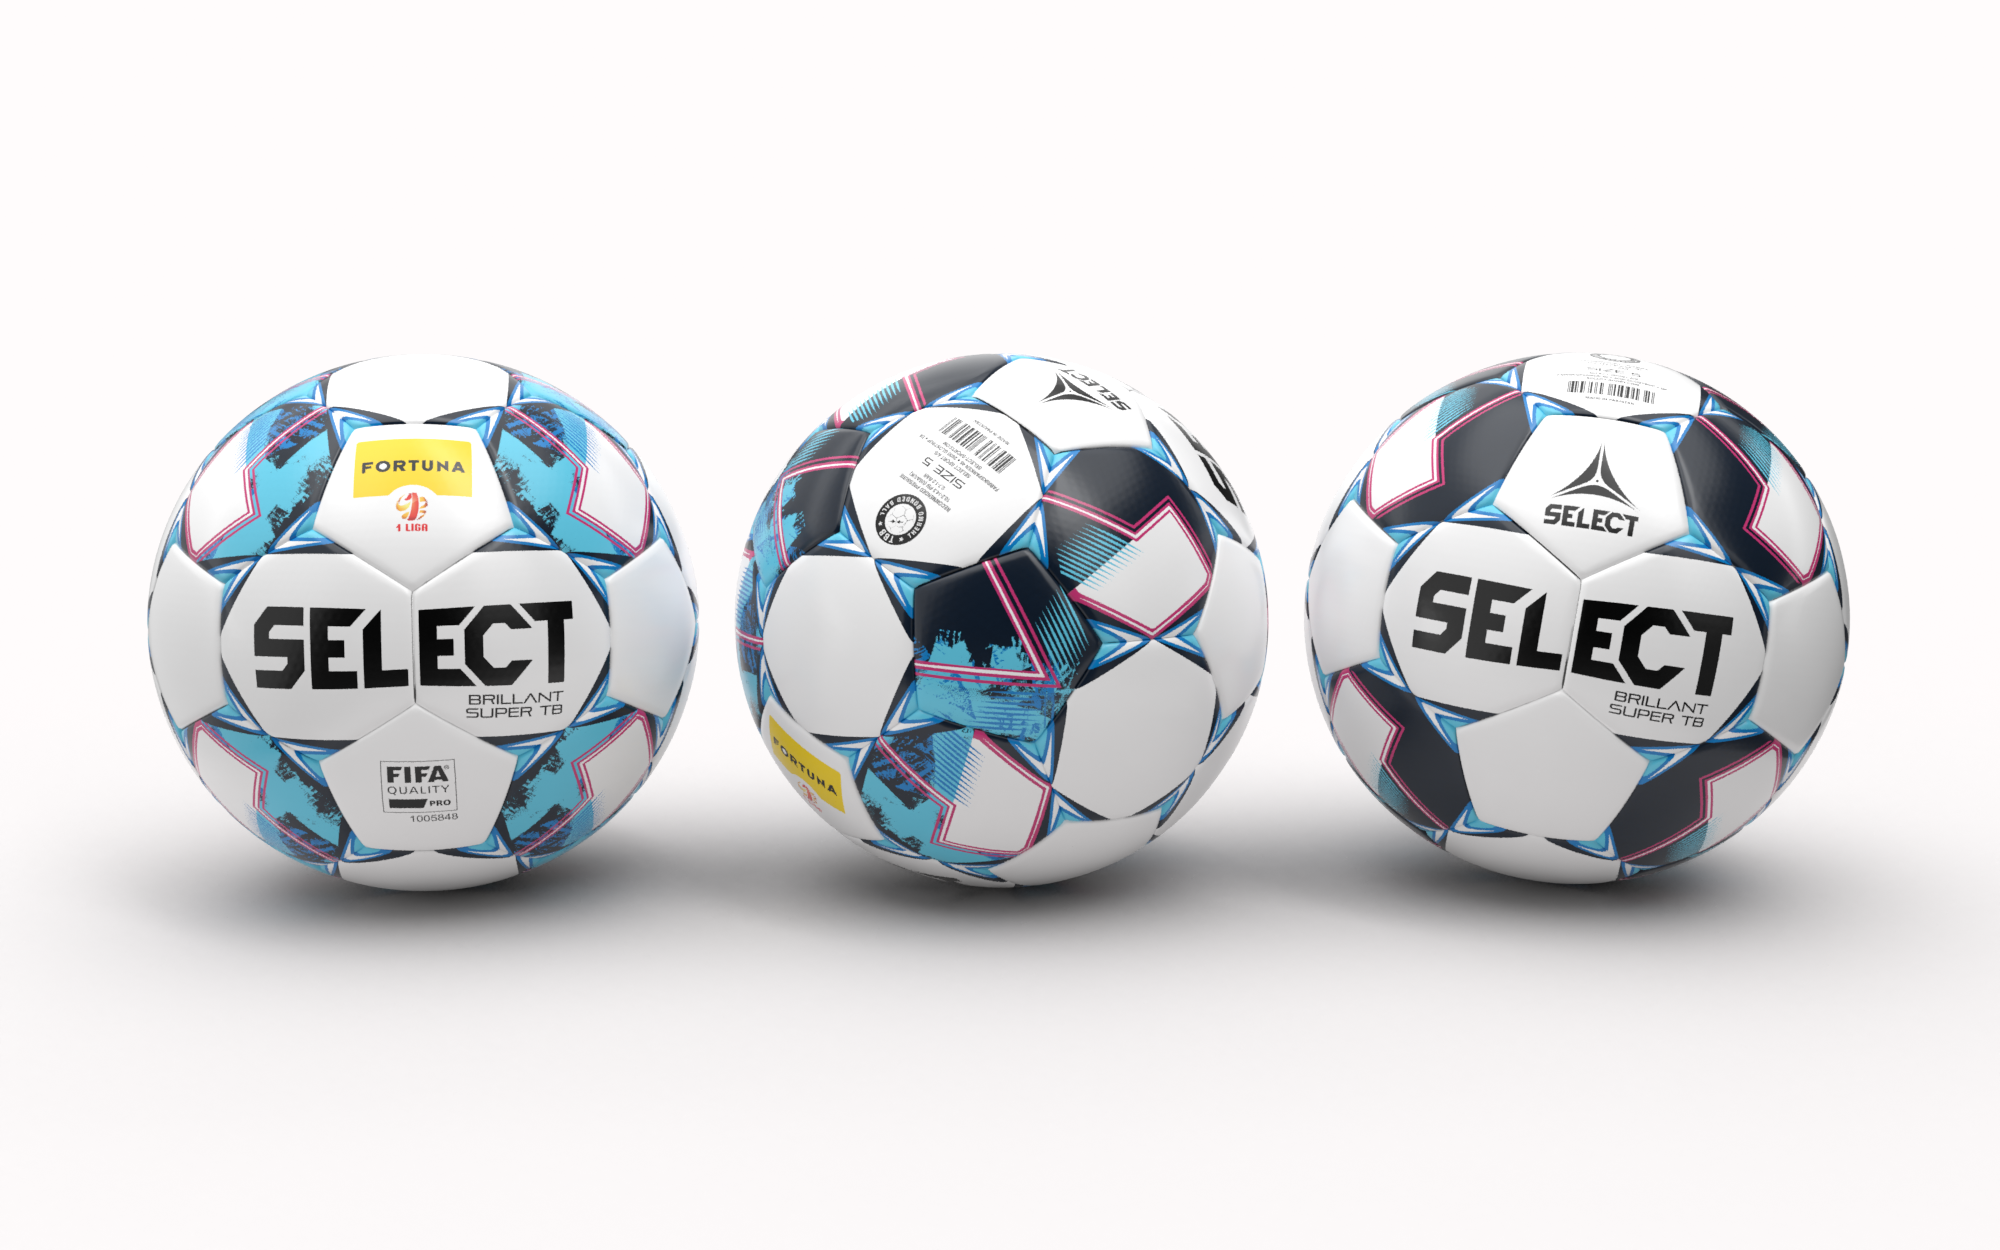 Nowa Piłka Select Brillant Super TB V21